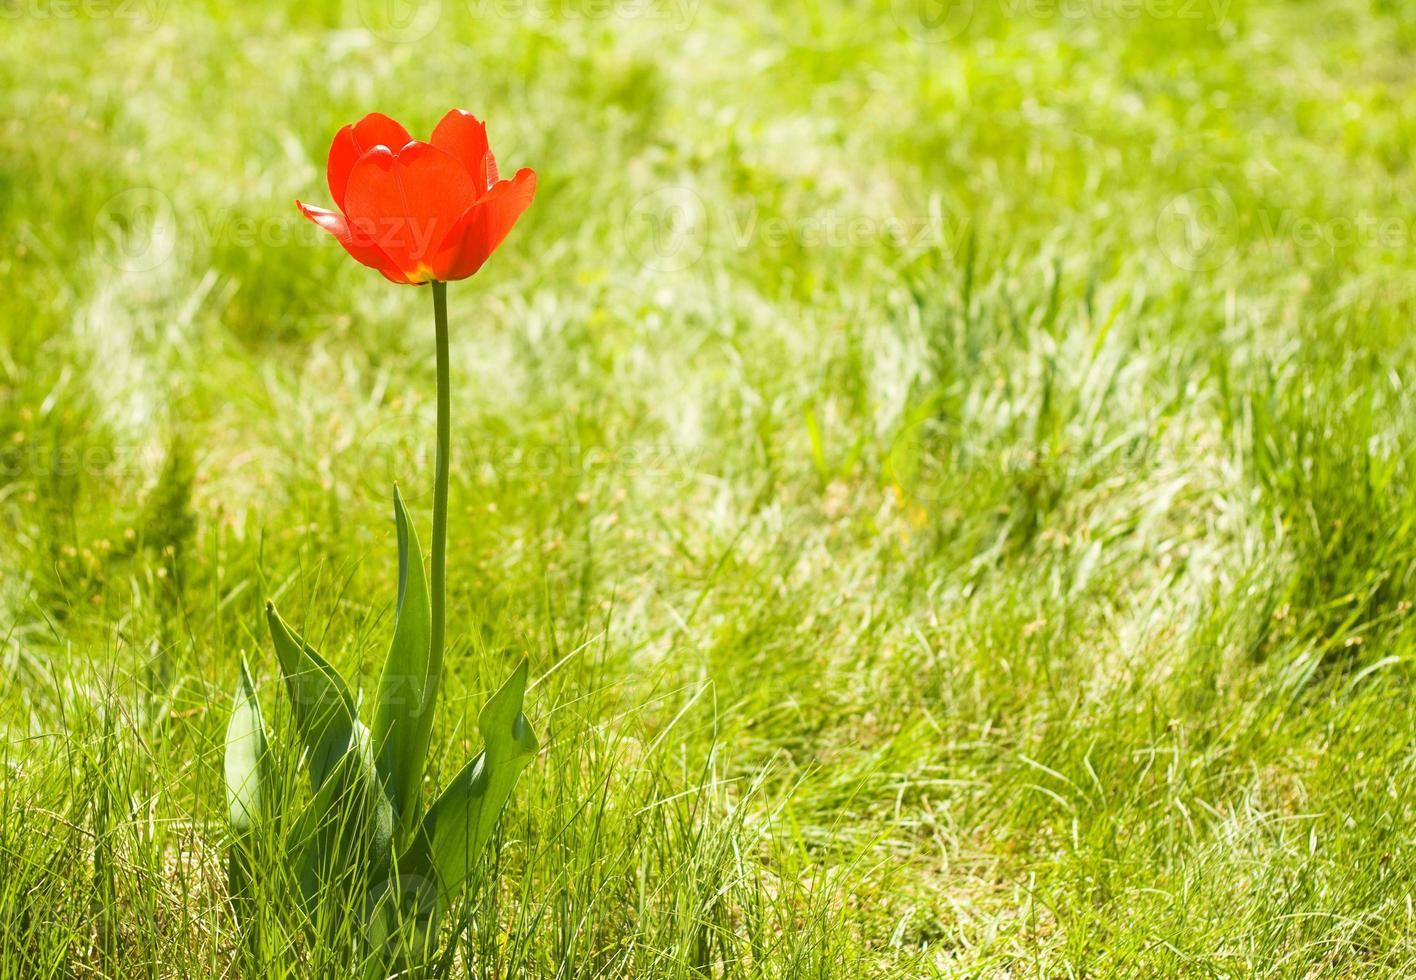 ensam blommatulpan utomhus. kopiera utrymme foto